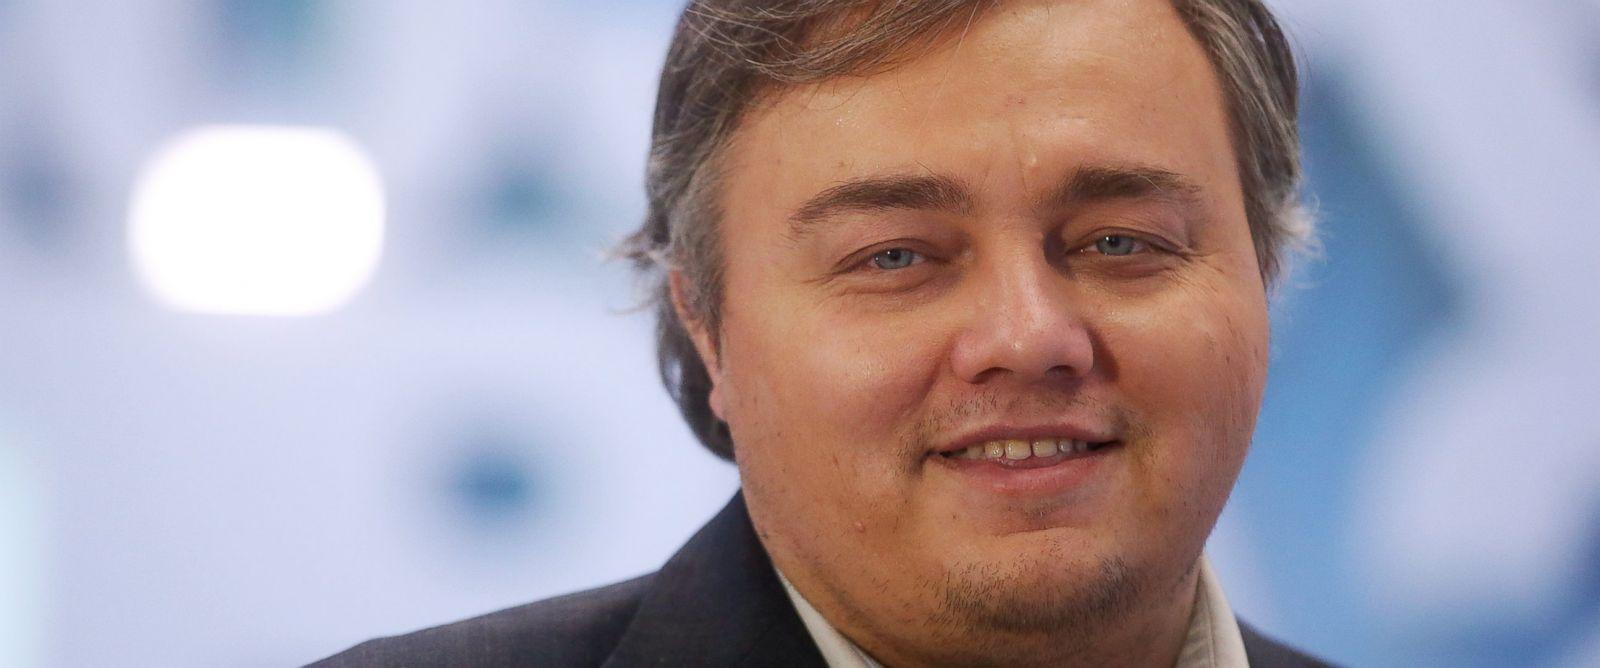 Fat Russian Leonardo DiCaprio Roman - Daily Mail Online